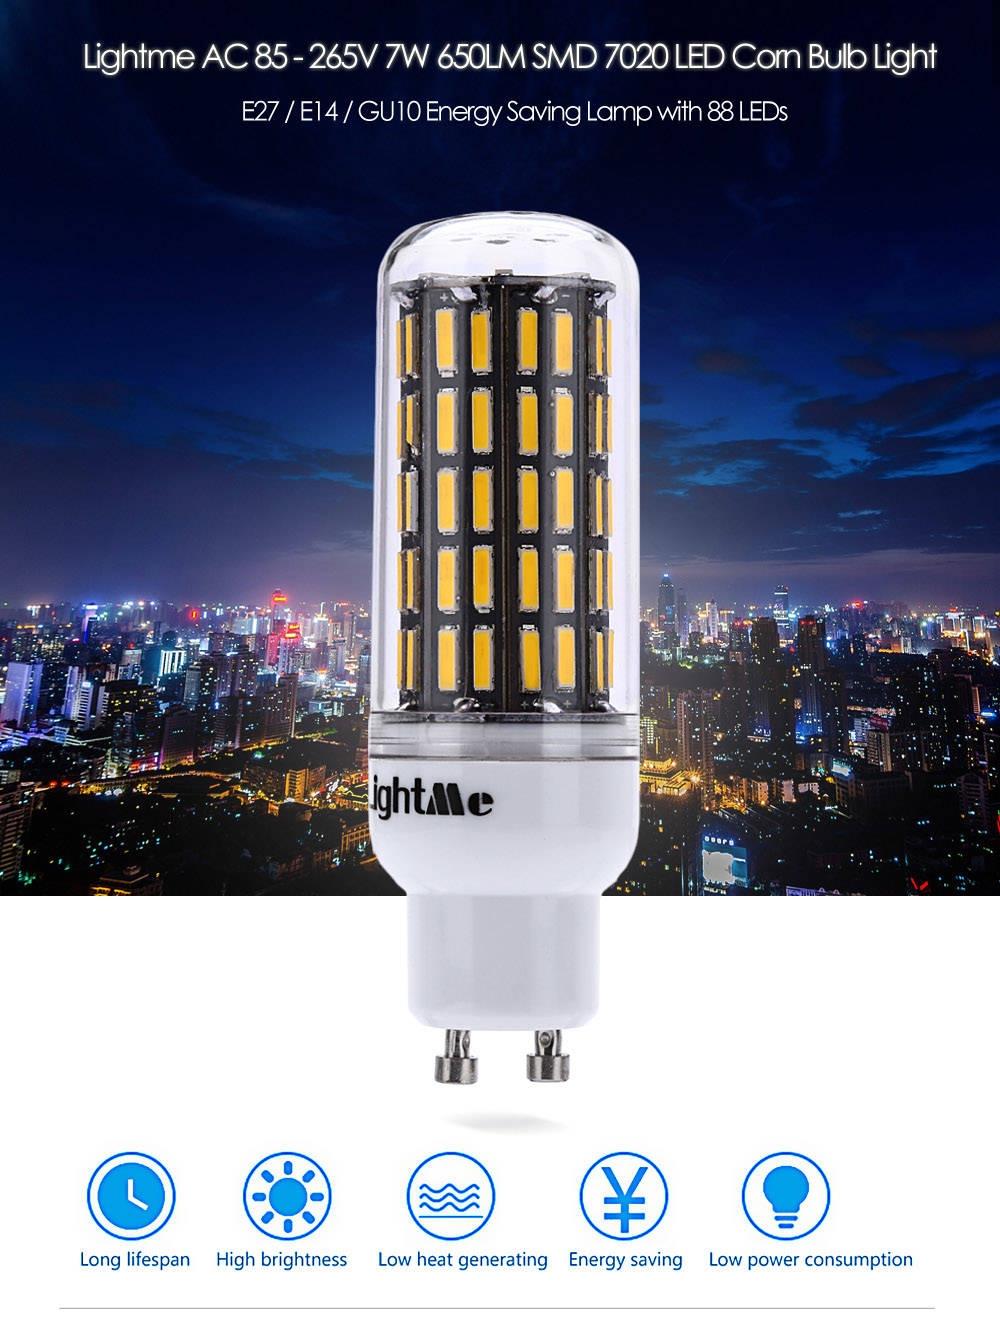 Lightme GU10 AC 85 - 265V 7W 650LM SMD 7020 LED Corn Bulb Light Energy Saving Lamp with 88 LEDs